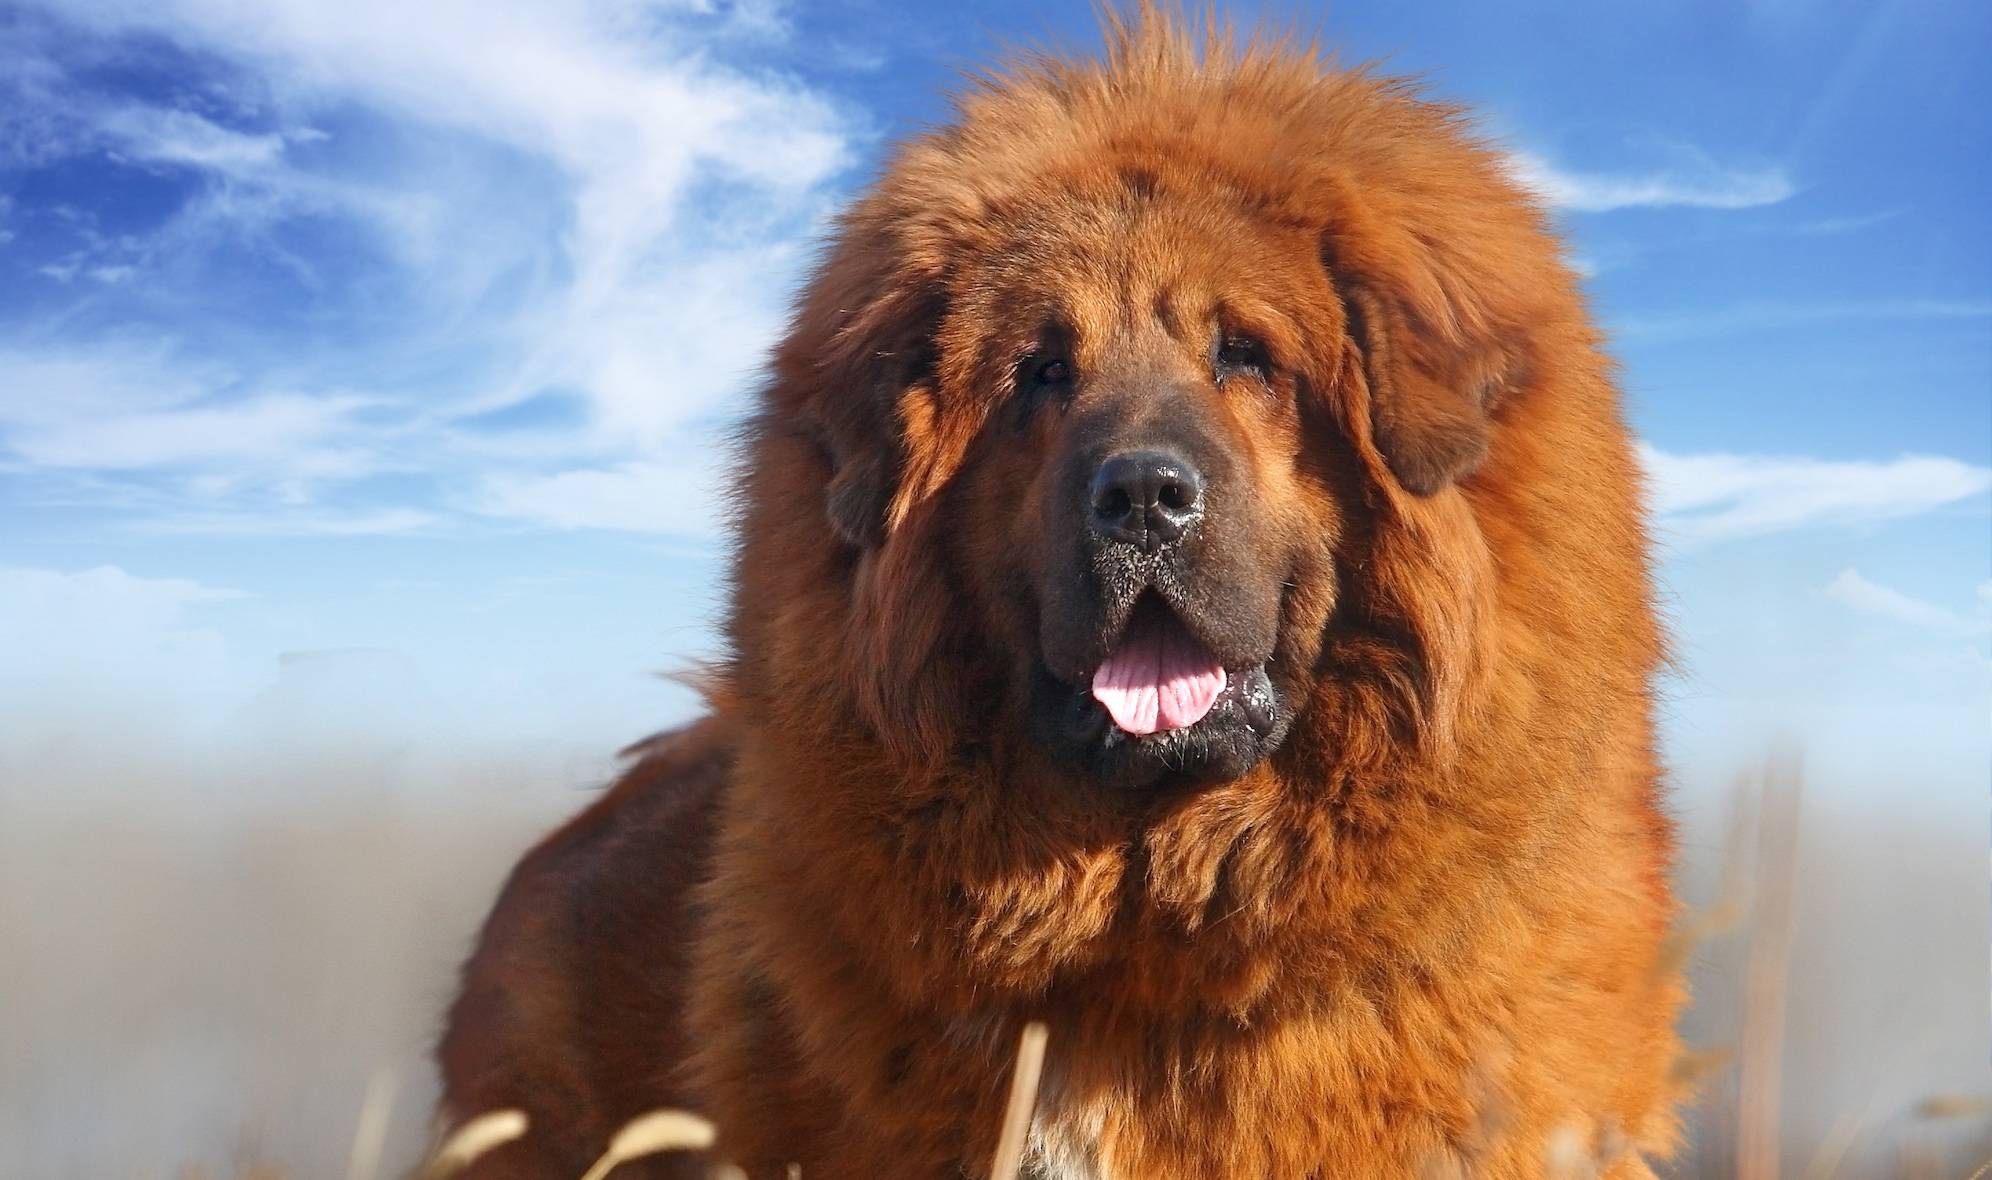 Тибетский мастиф: 100 фото, описание породы, окрас, уход за шерстью, цена щенков, уход, характер